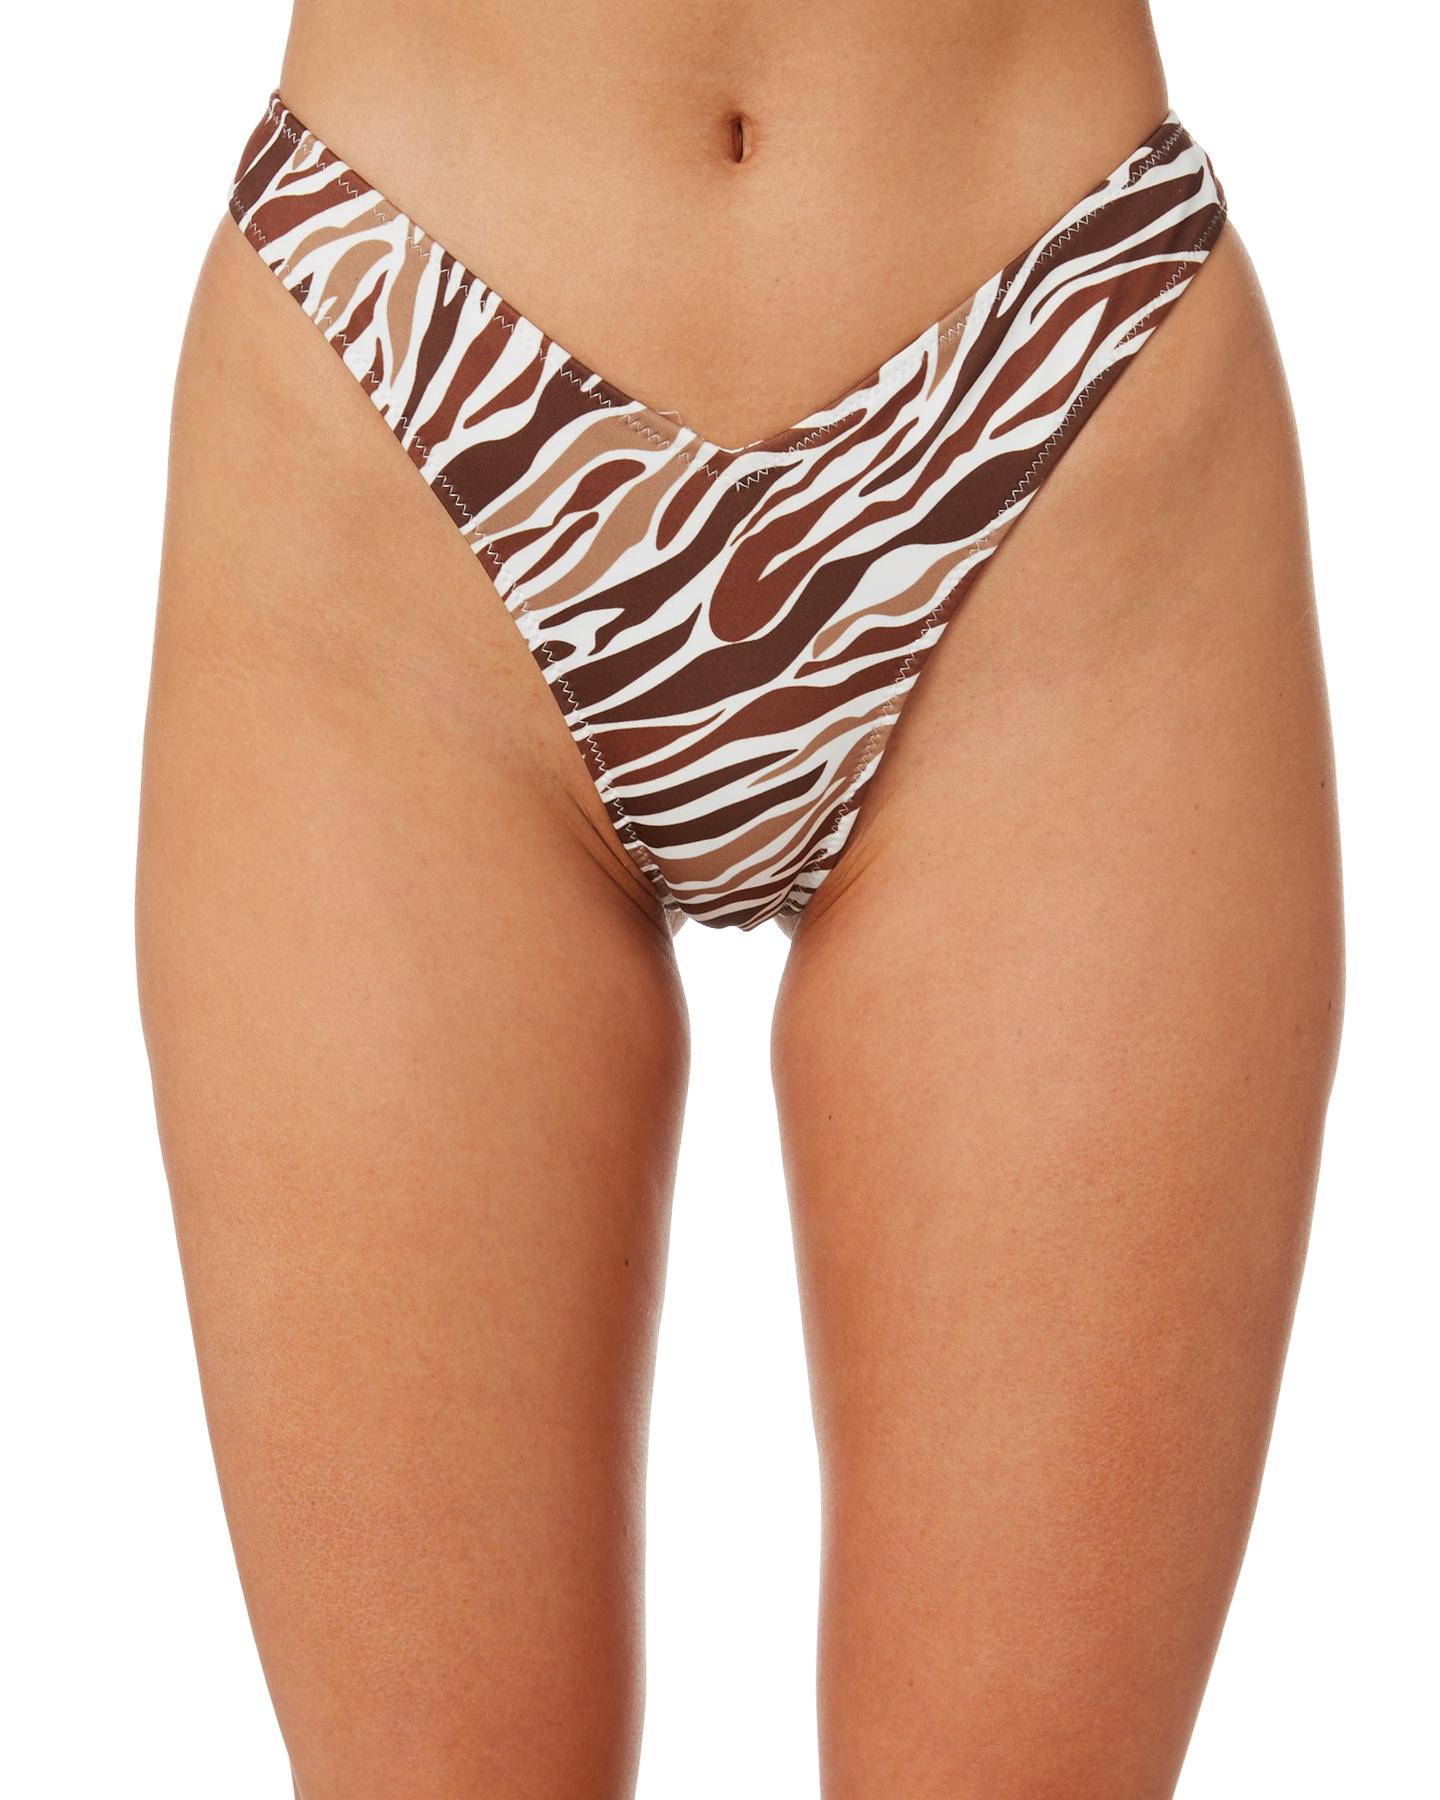 Lahana Remi Bottom Brown Zebra